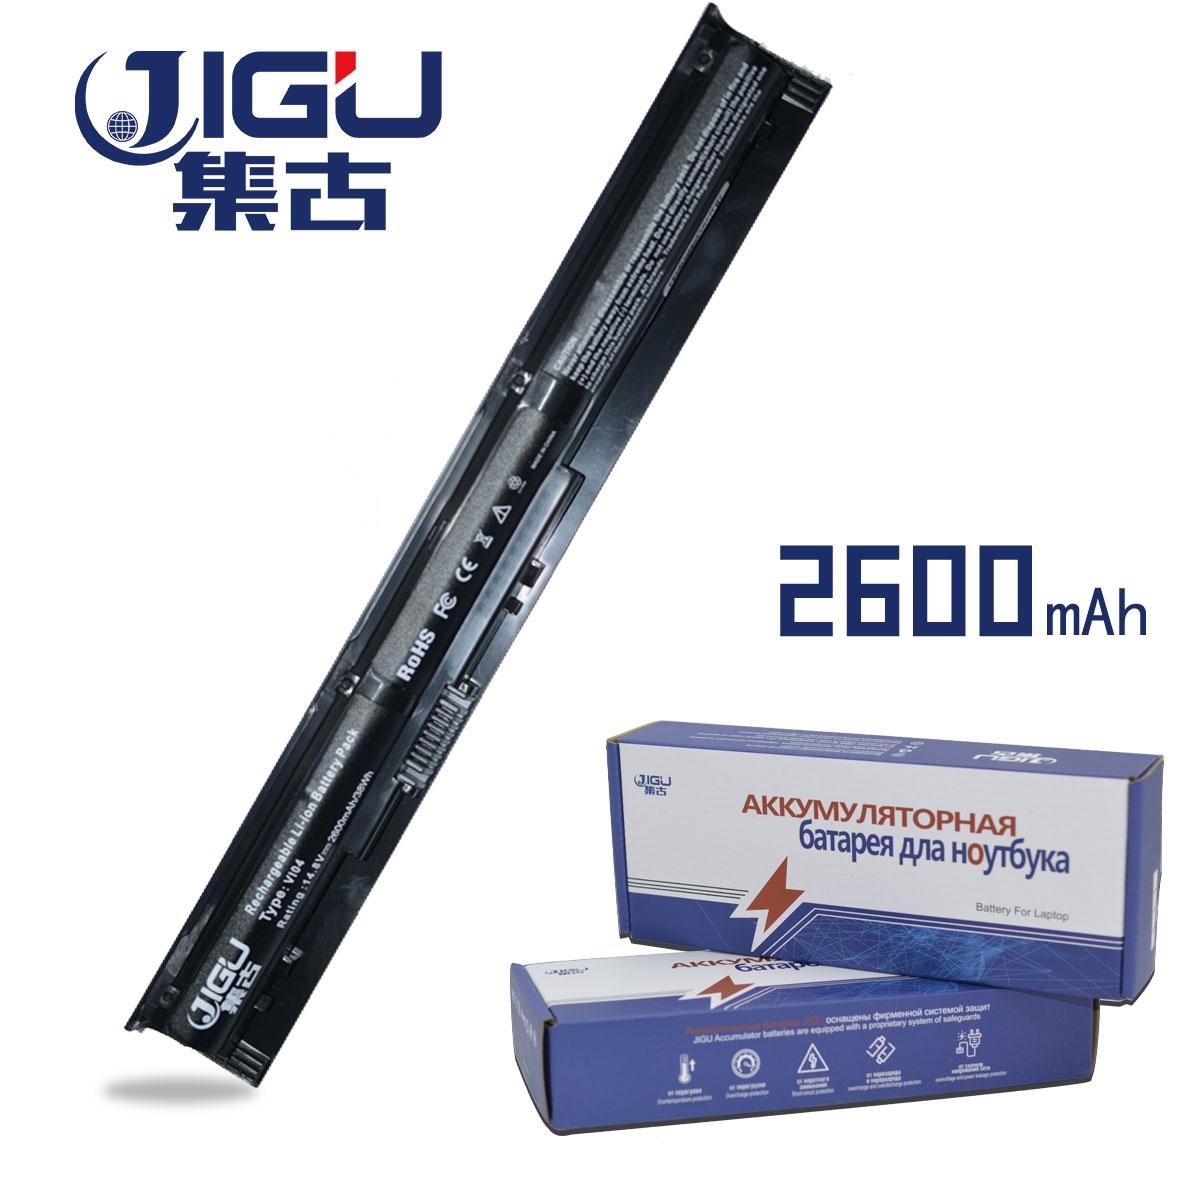 JIGU 2600mah VI04 Laptop Battery TPN-Q140 TPN-Q141 756478-421 HSTNN-DB6K LB6K For HP Pavilion 17 15 For ENVY 15-K028TX K031TX